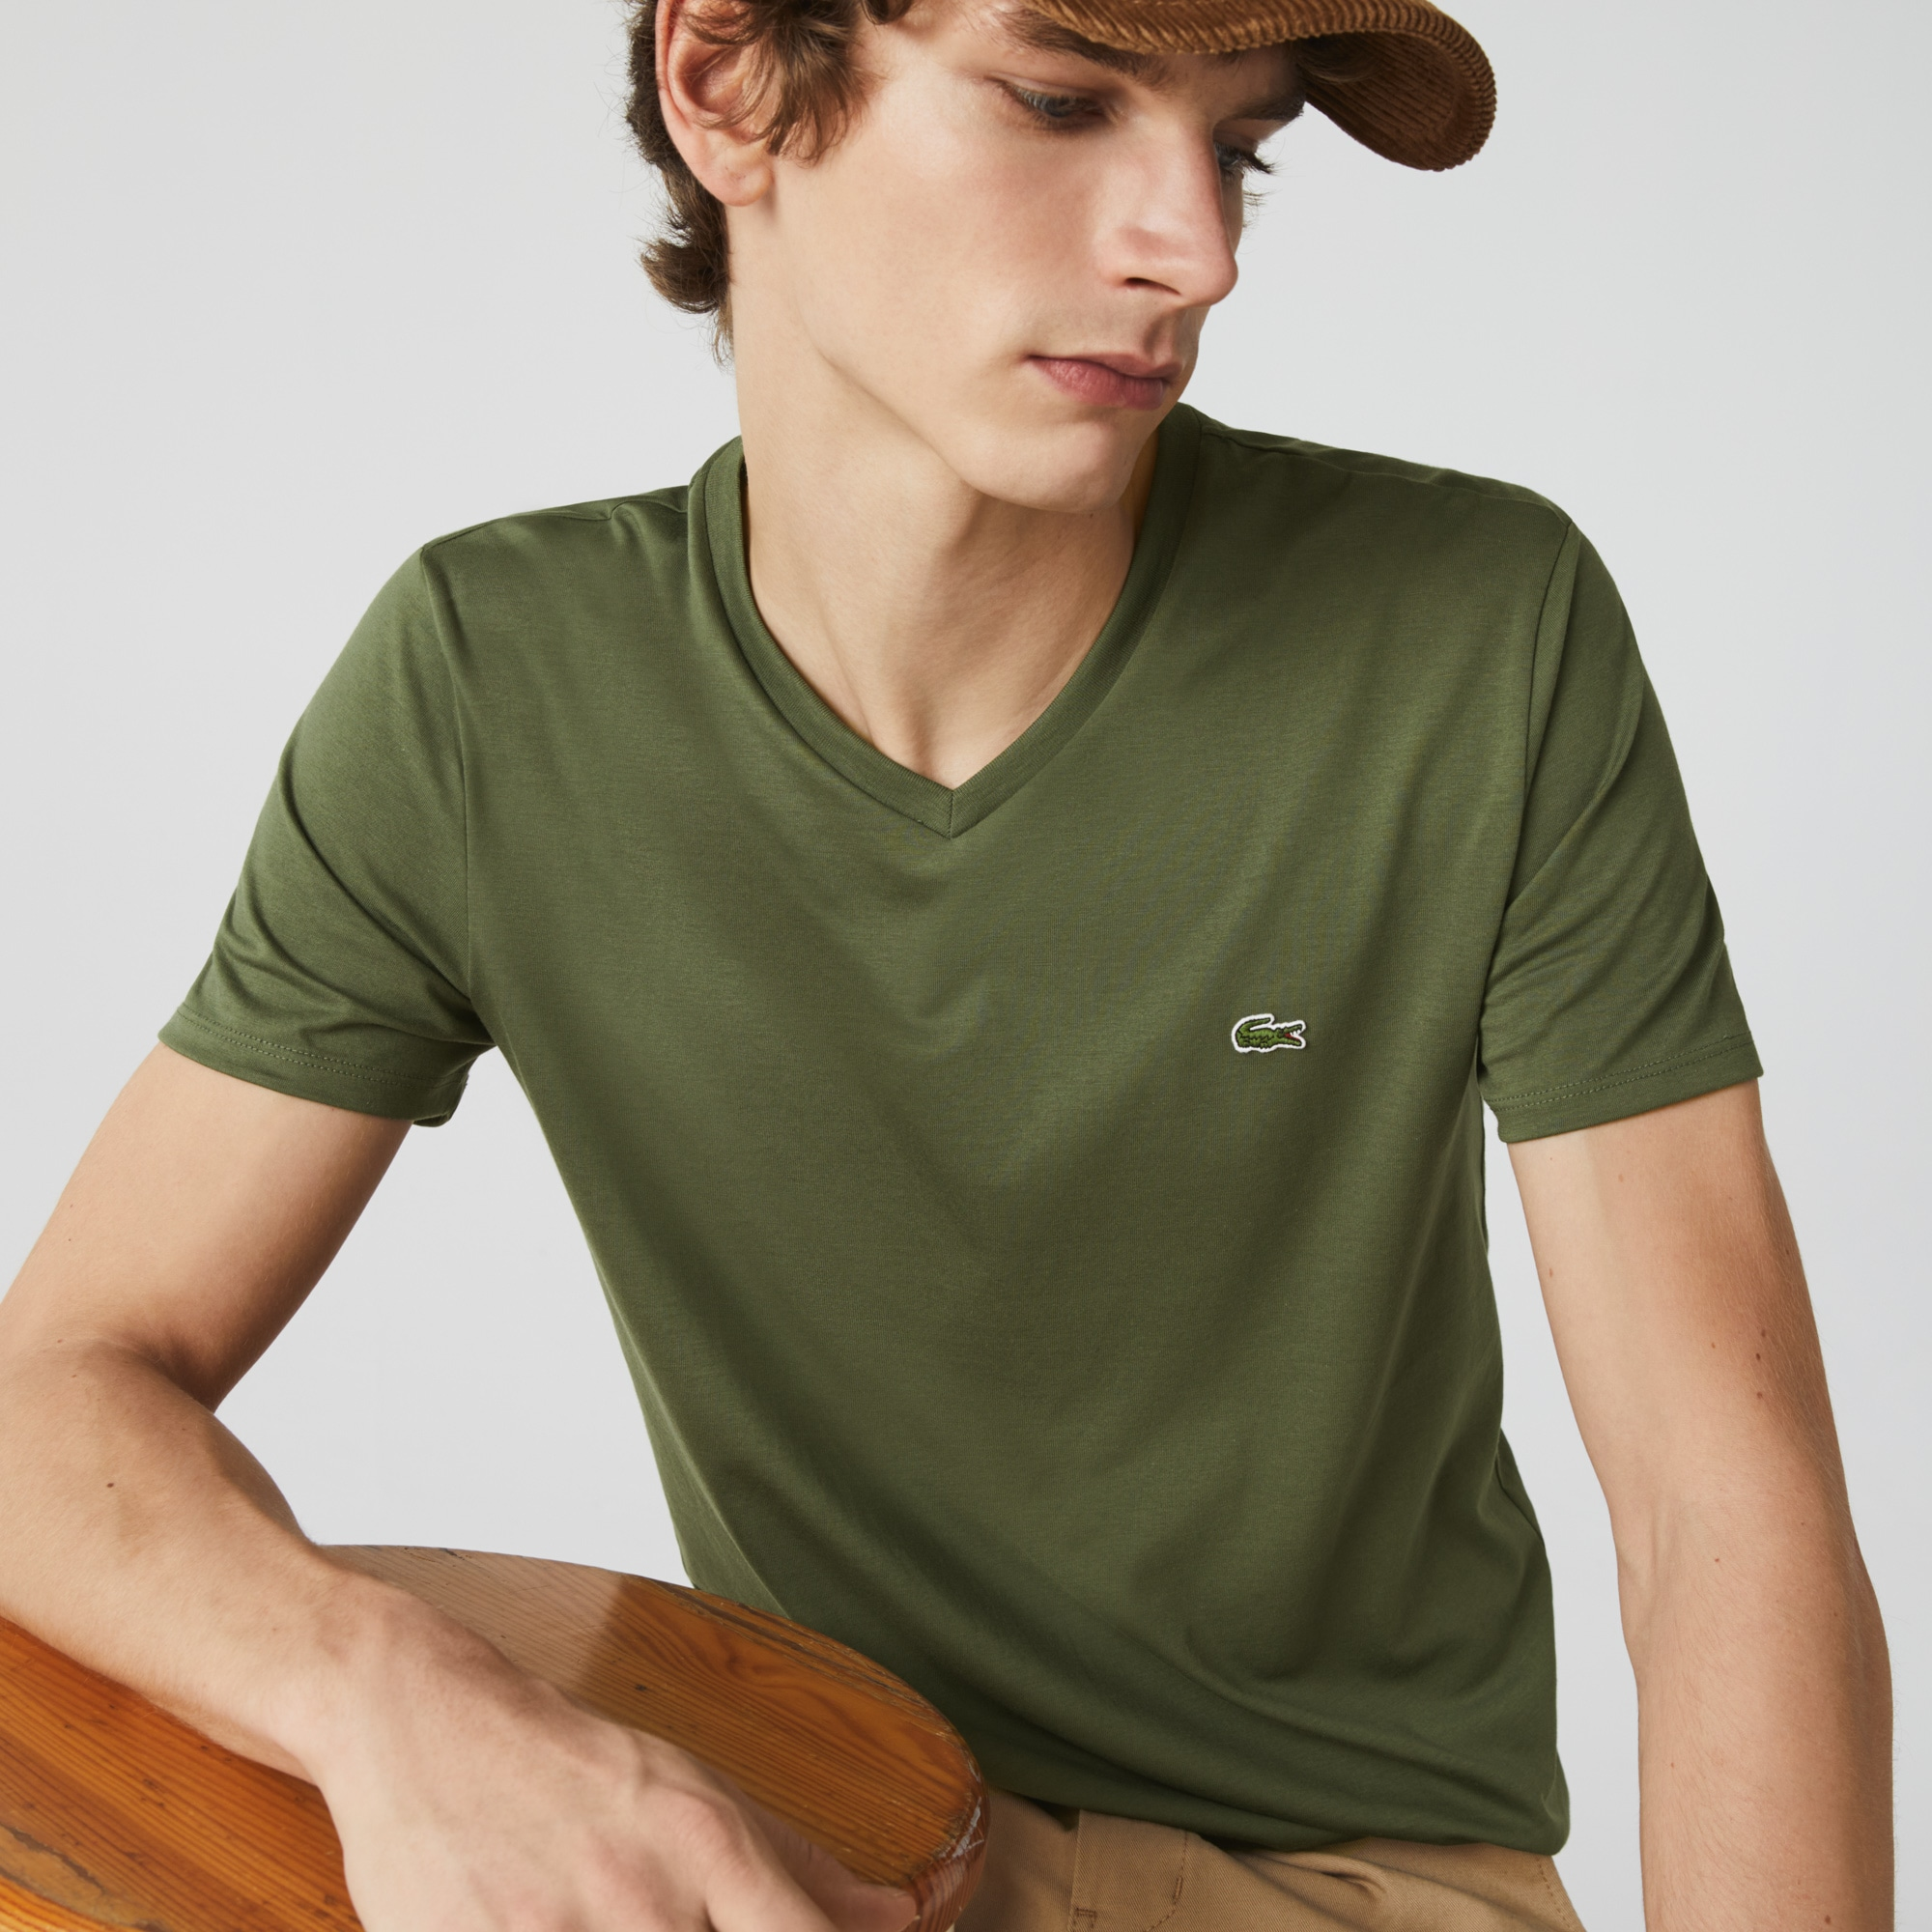 Lacoste Mens V-neck Pima Cotton Jersey T-shirt